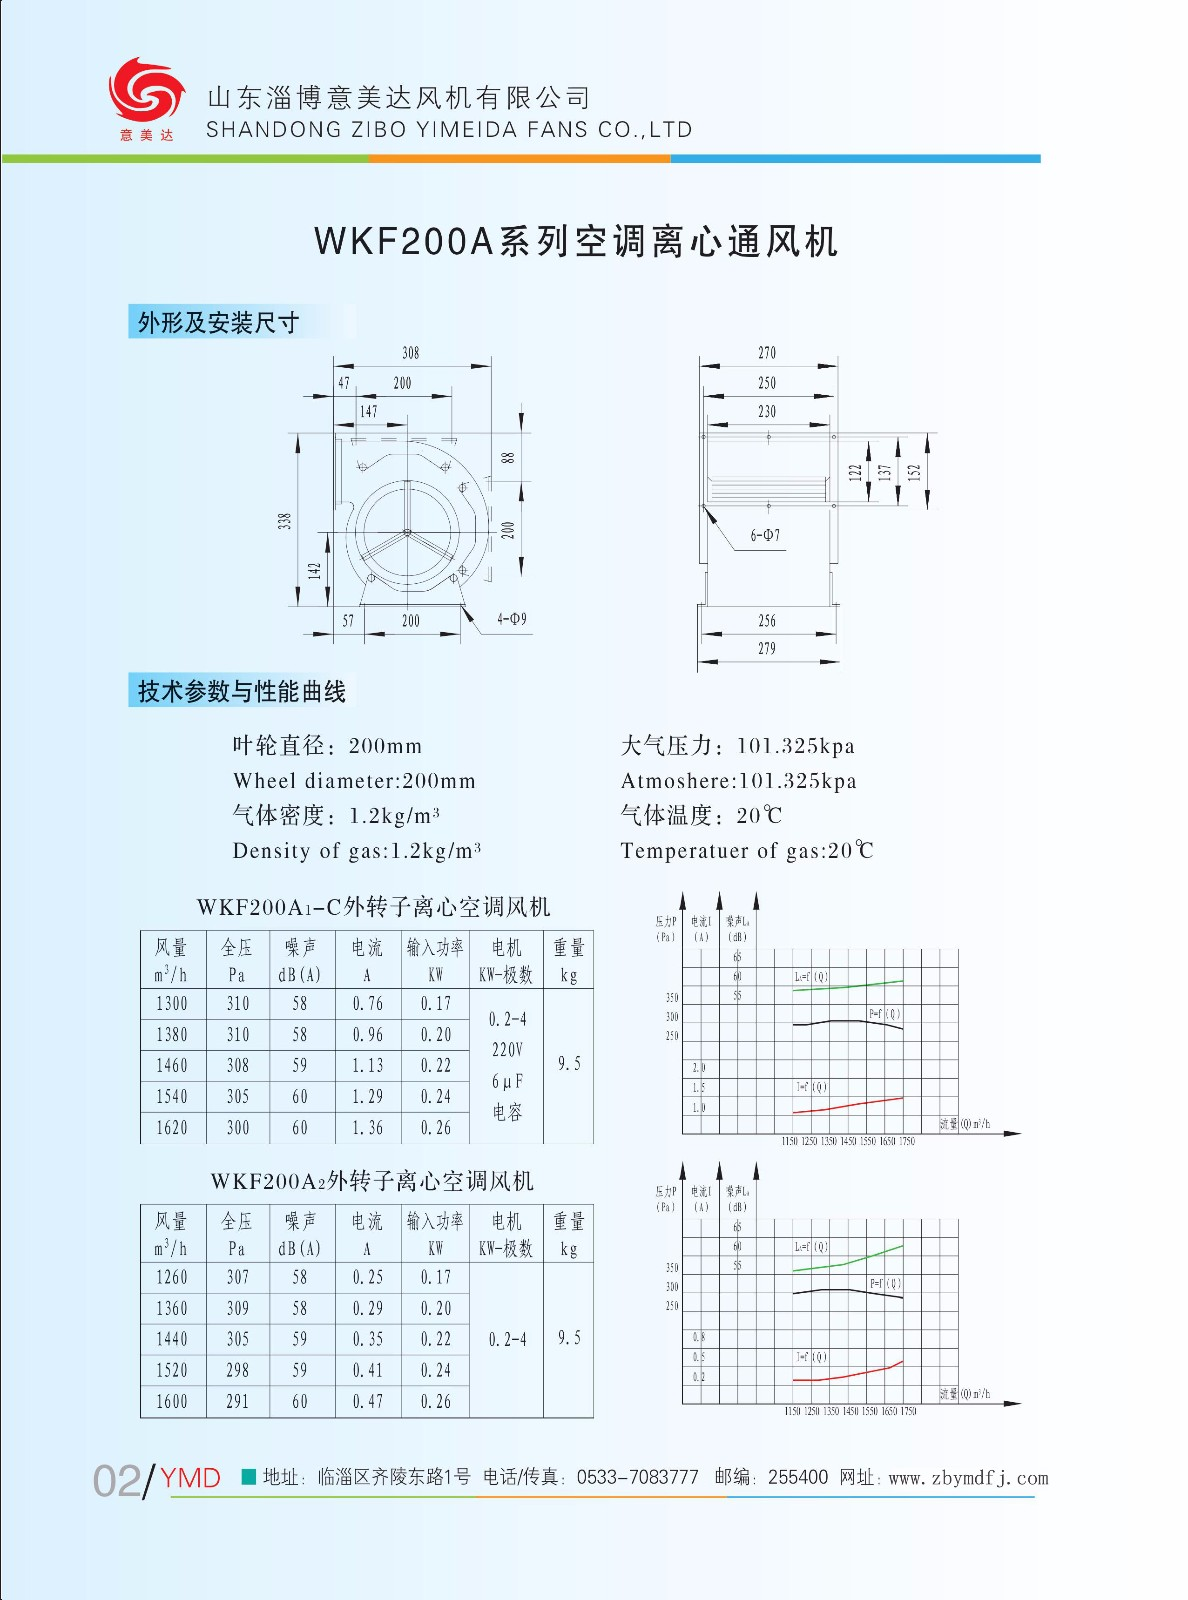 WKF200A4|WKF200A-山东淄博意美达风机有限公司